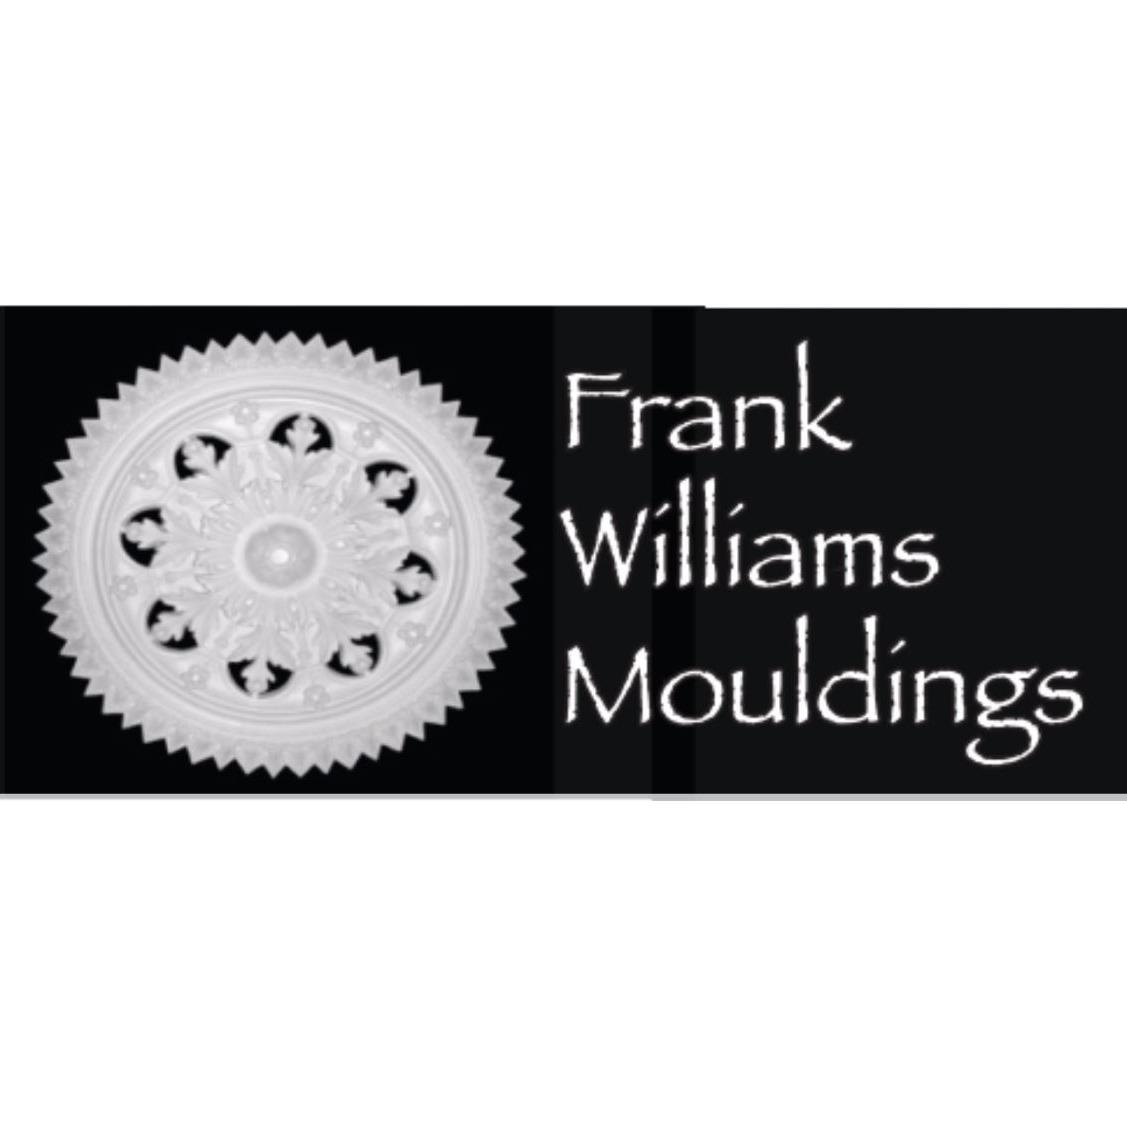 Frank Williams Plaster Mouldings